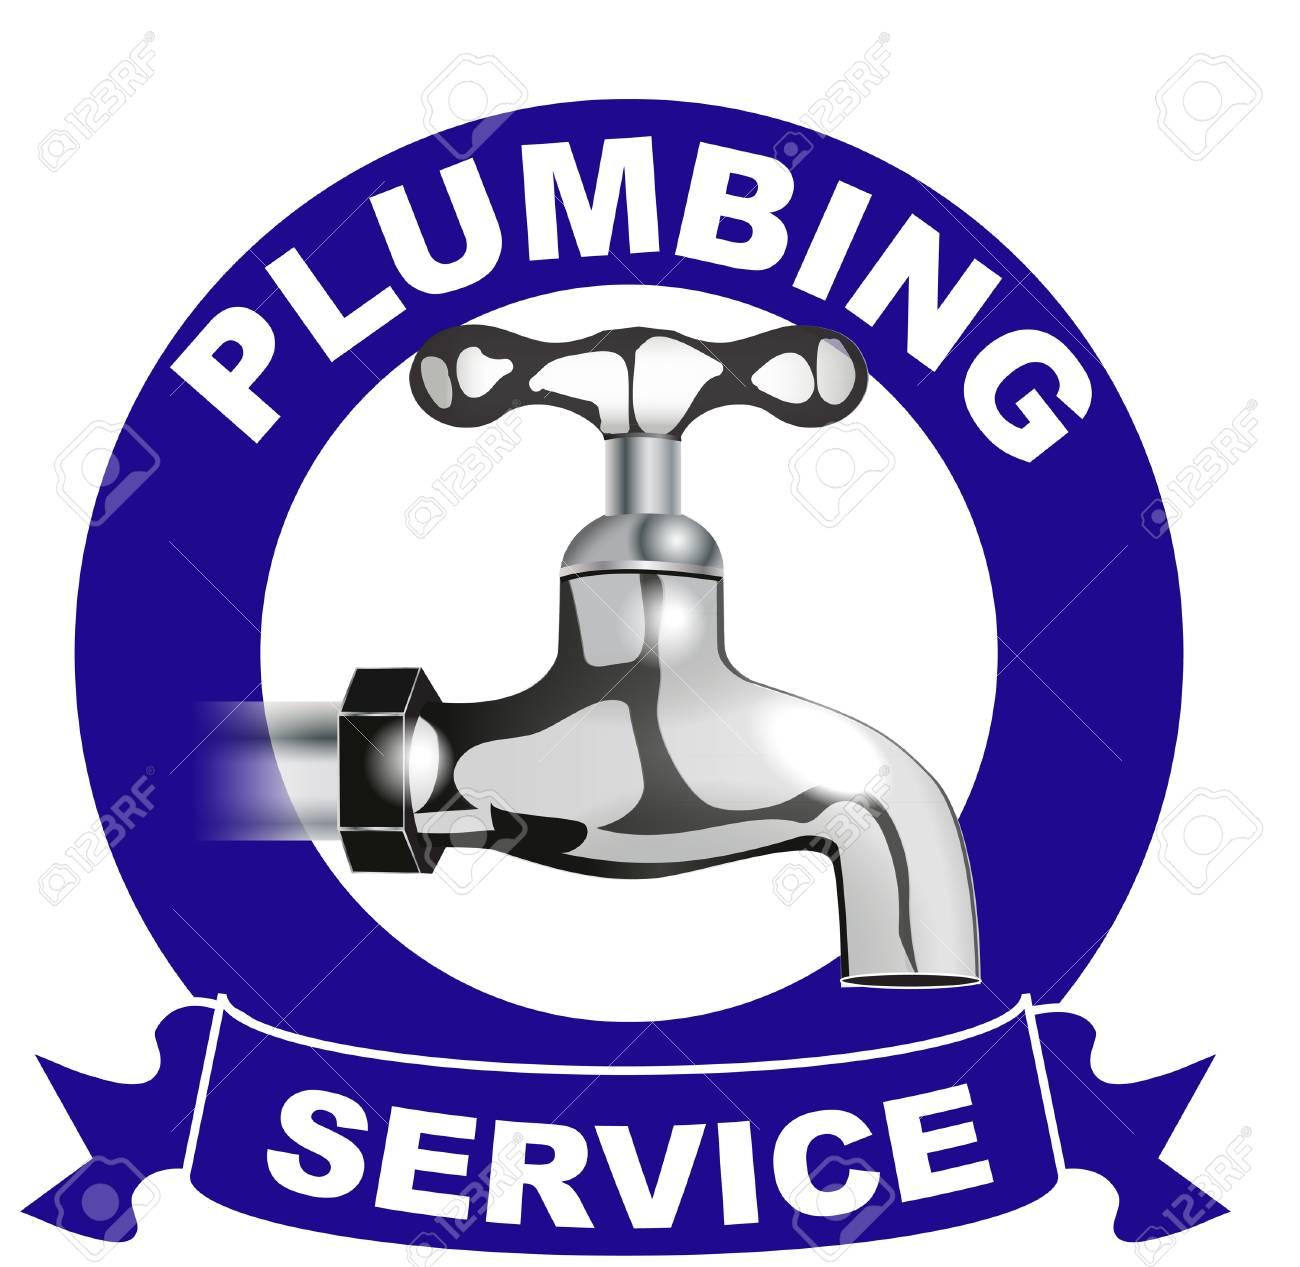 plumbing services logo stock photo picture and royalty free image rh 123rf com plumbing logos free plumbing logo ideas